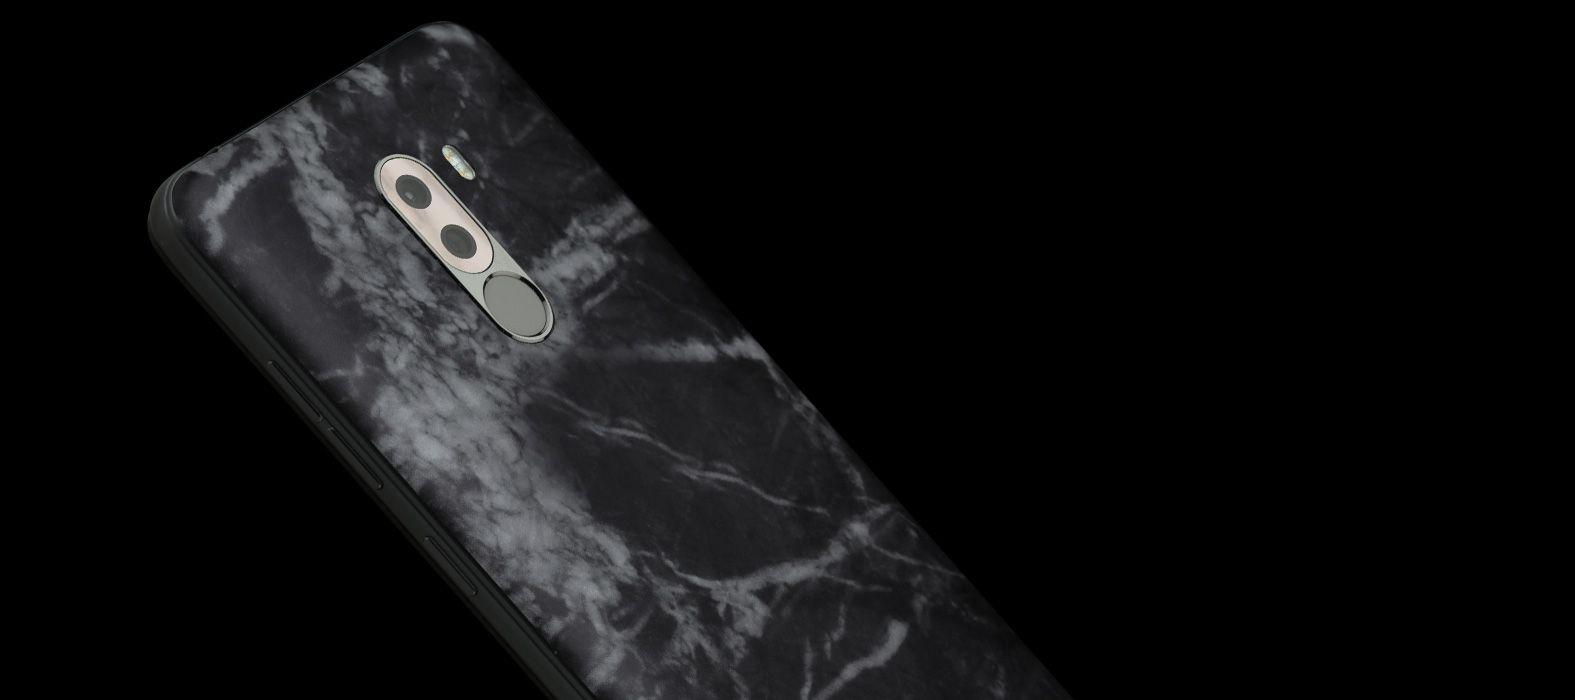 Poco-F1s_Black-Marble_Skins